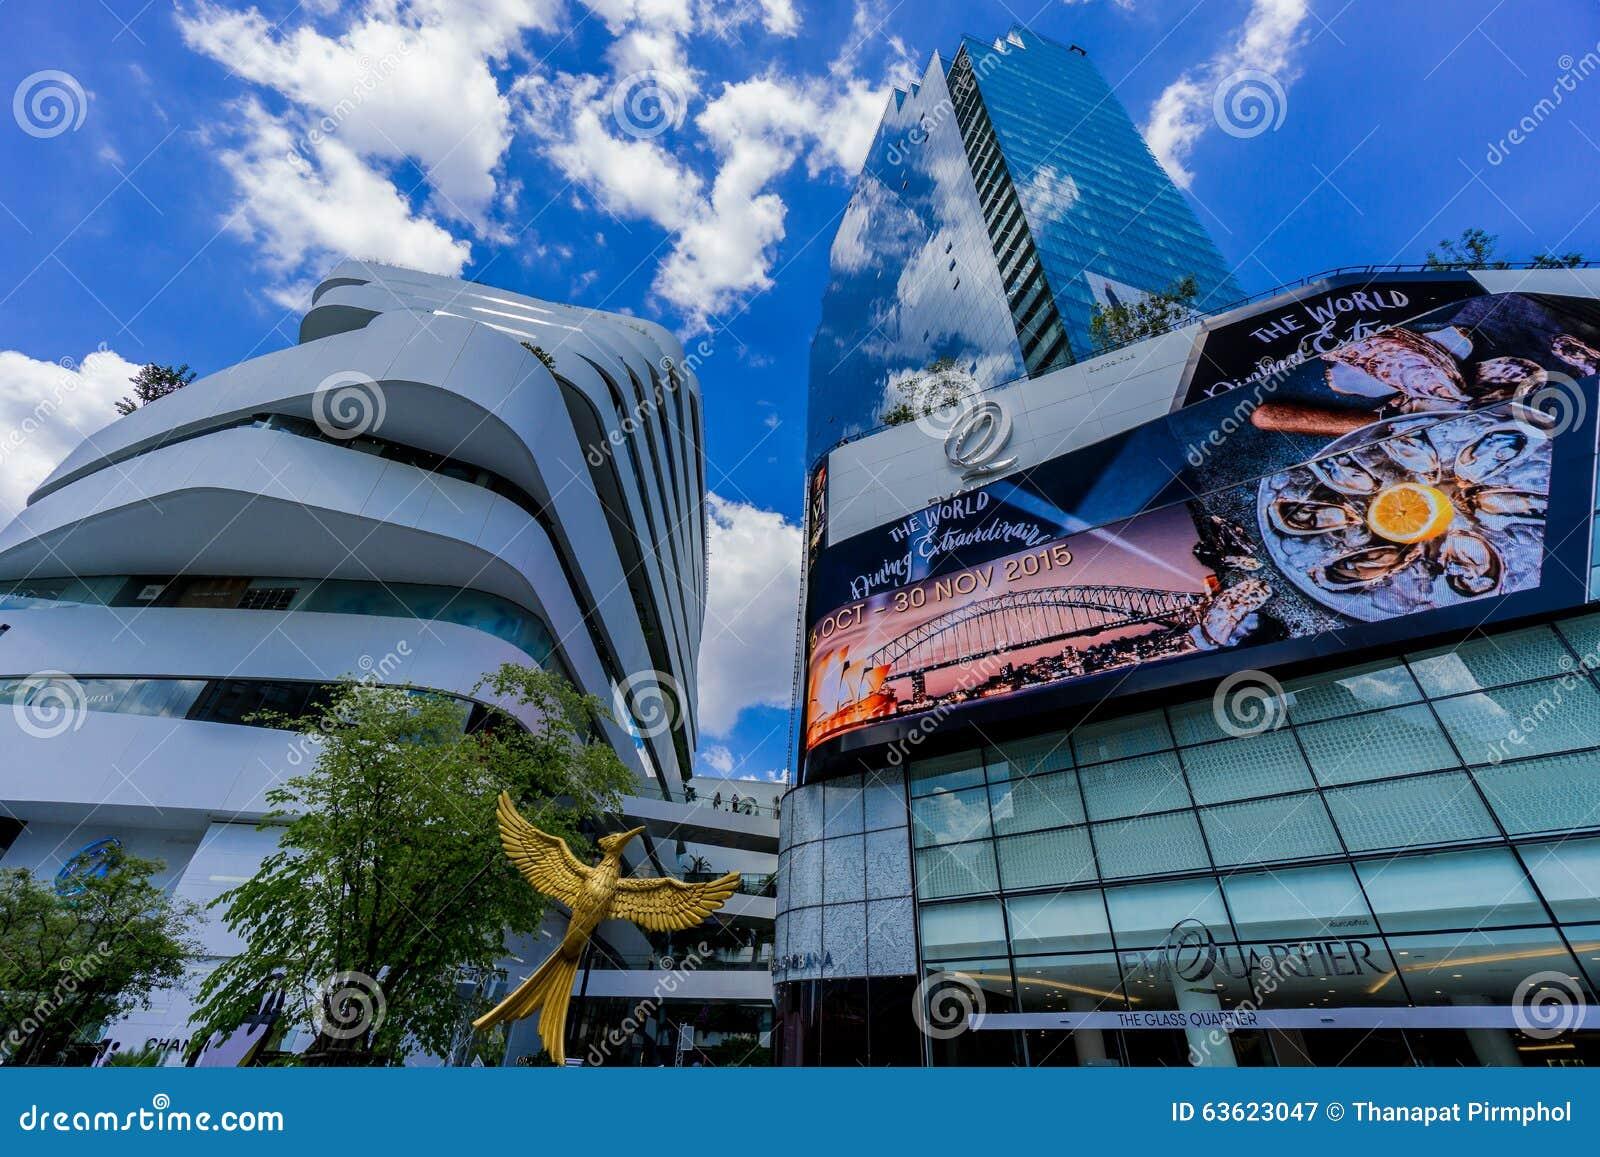 Bangkok, Thailand - 22 November 2015 : Emquartier shopping mall (The EM District World Class Shopping Extraordinaire) at BTS Phrom